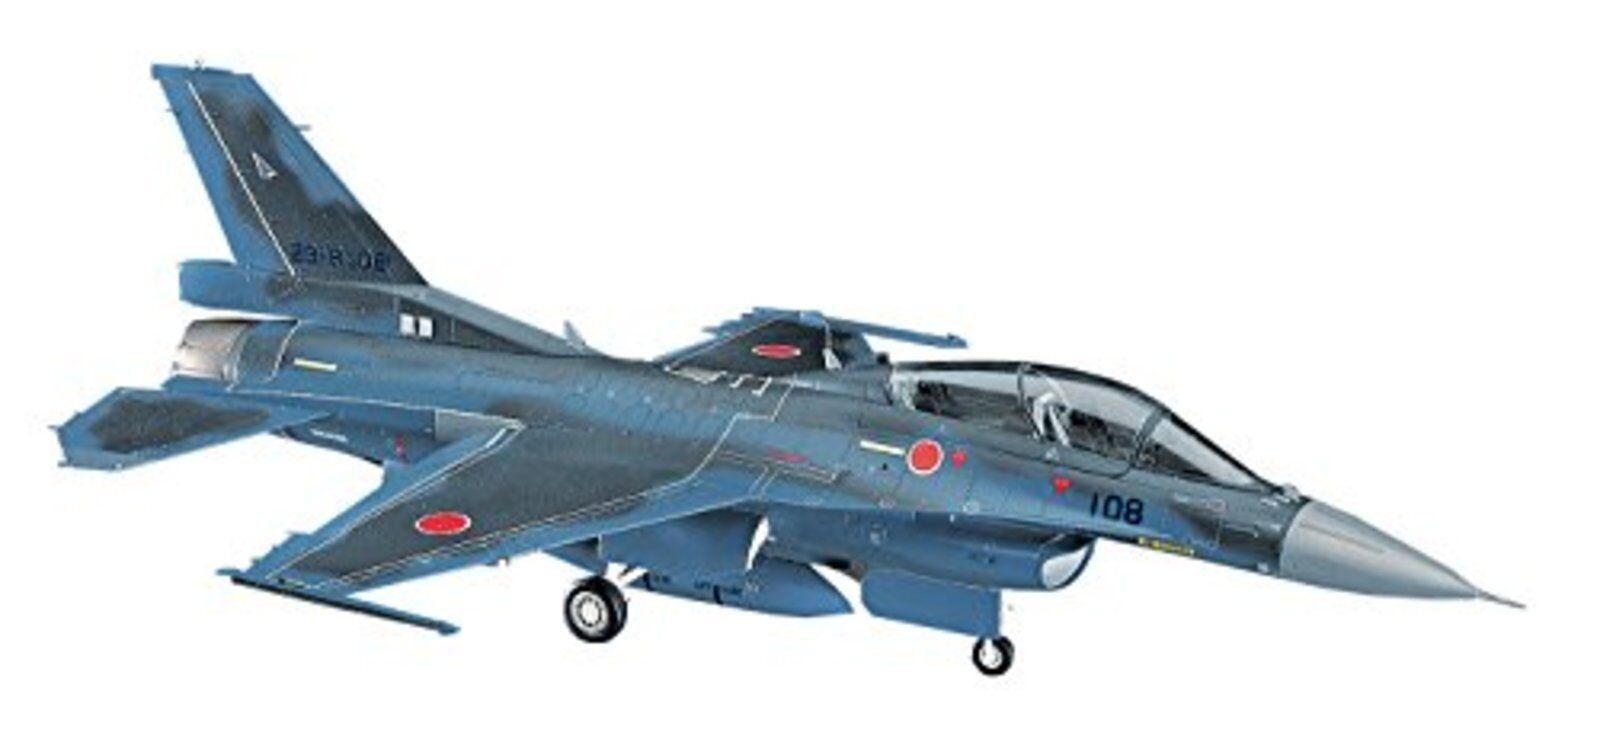 Hasegawa 1 48 Mitsubishi F1 6th Sq Sea Camouflage Jasdf Support Fighter Hsg7354 For Sale Online Ebay